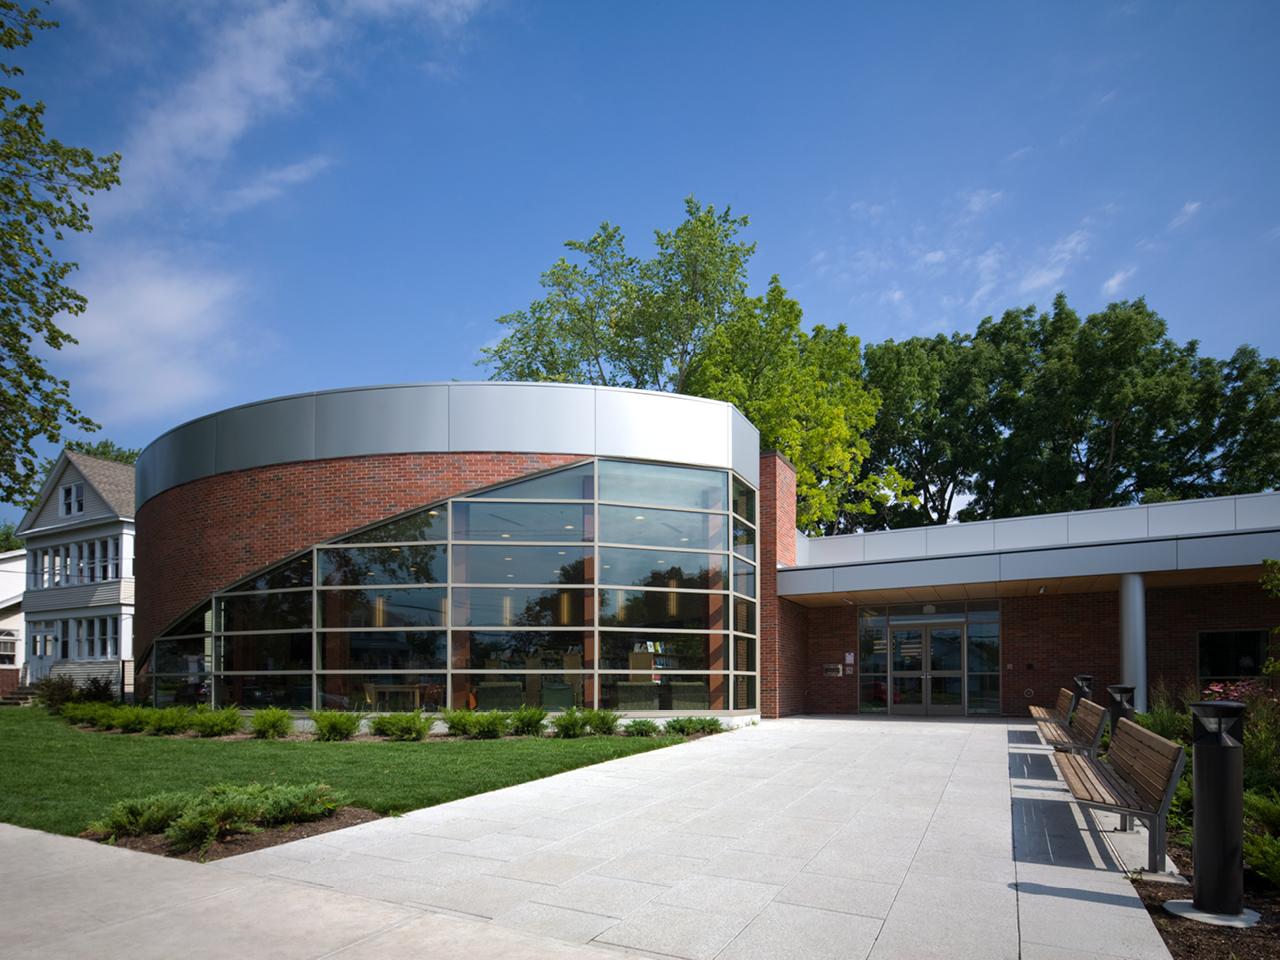 kevin-hom-architect-university-college-architect-albany-new-scotland-library-1